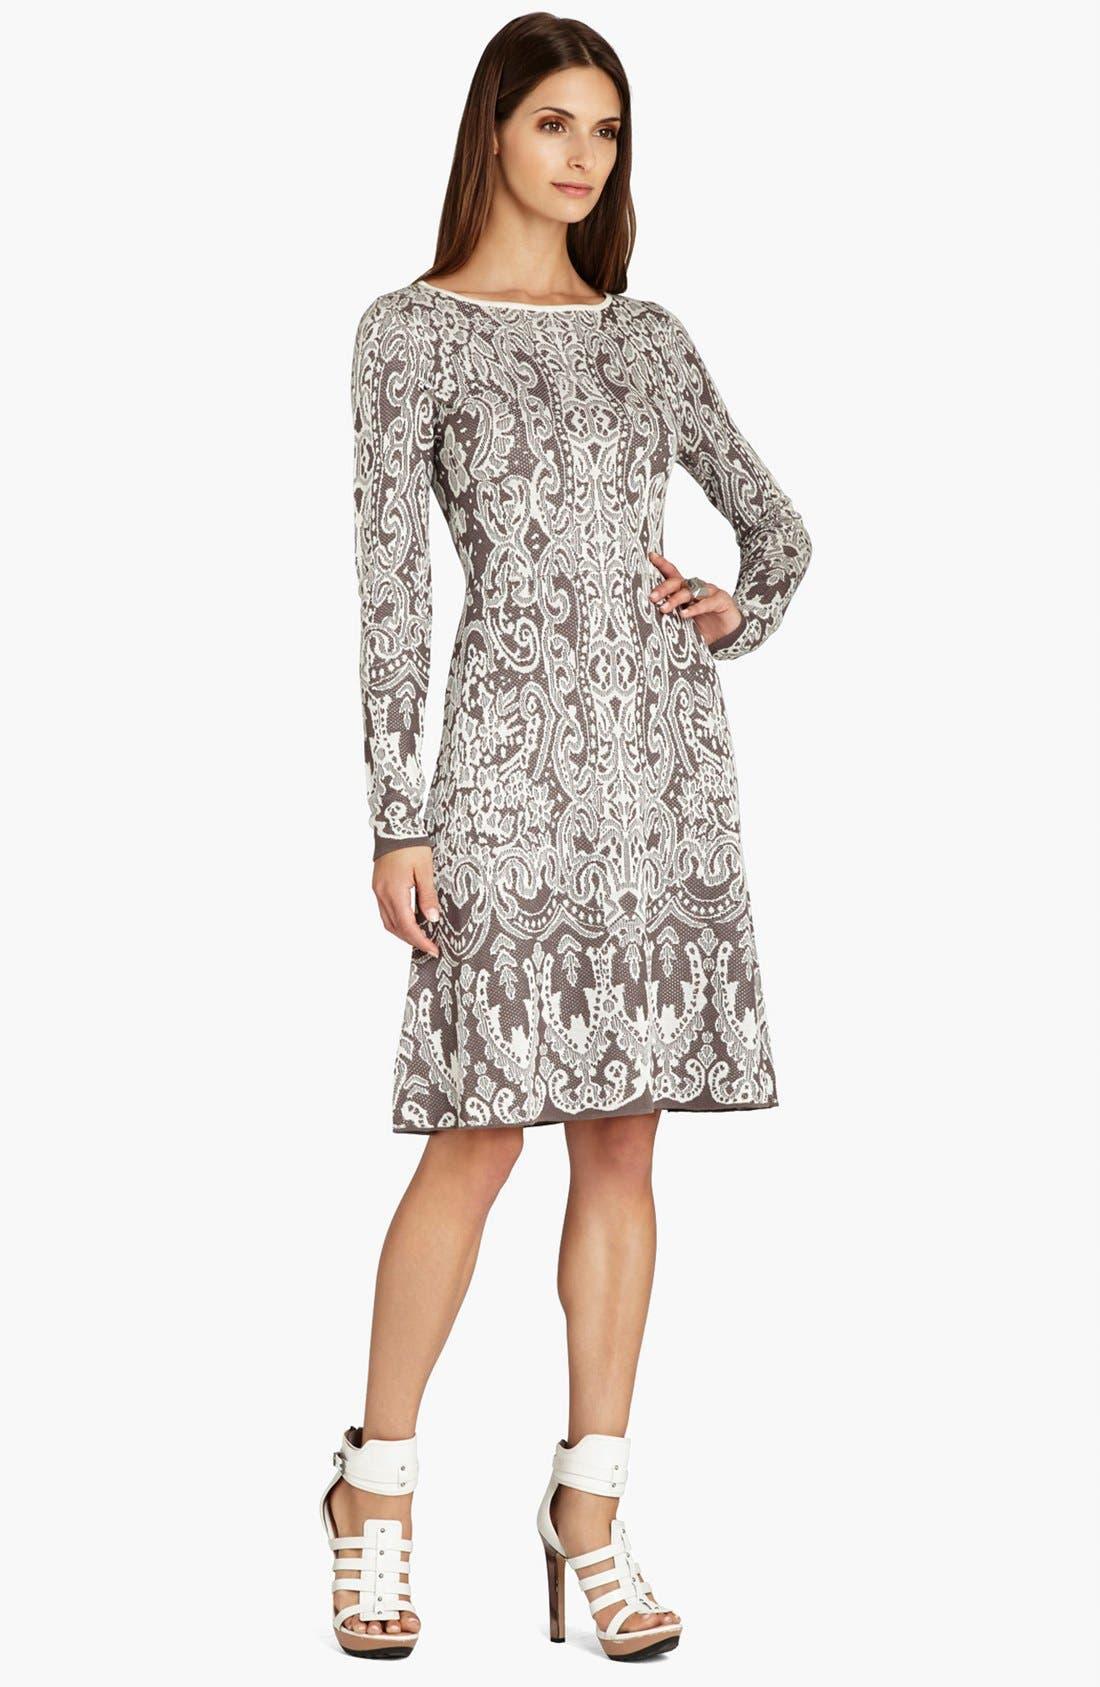 Alternate Image 1 Selected - BCBGMAXAZRIA Intarsia Jacquard Sweater Dress